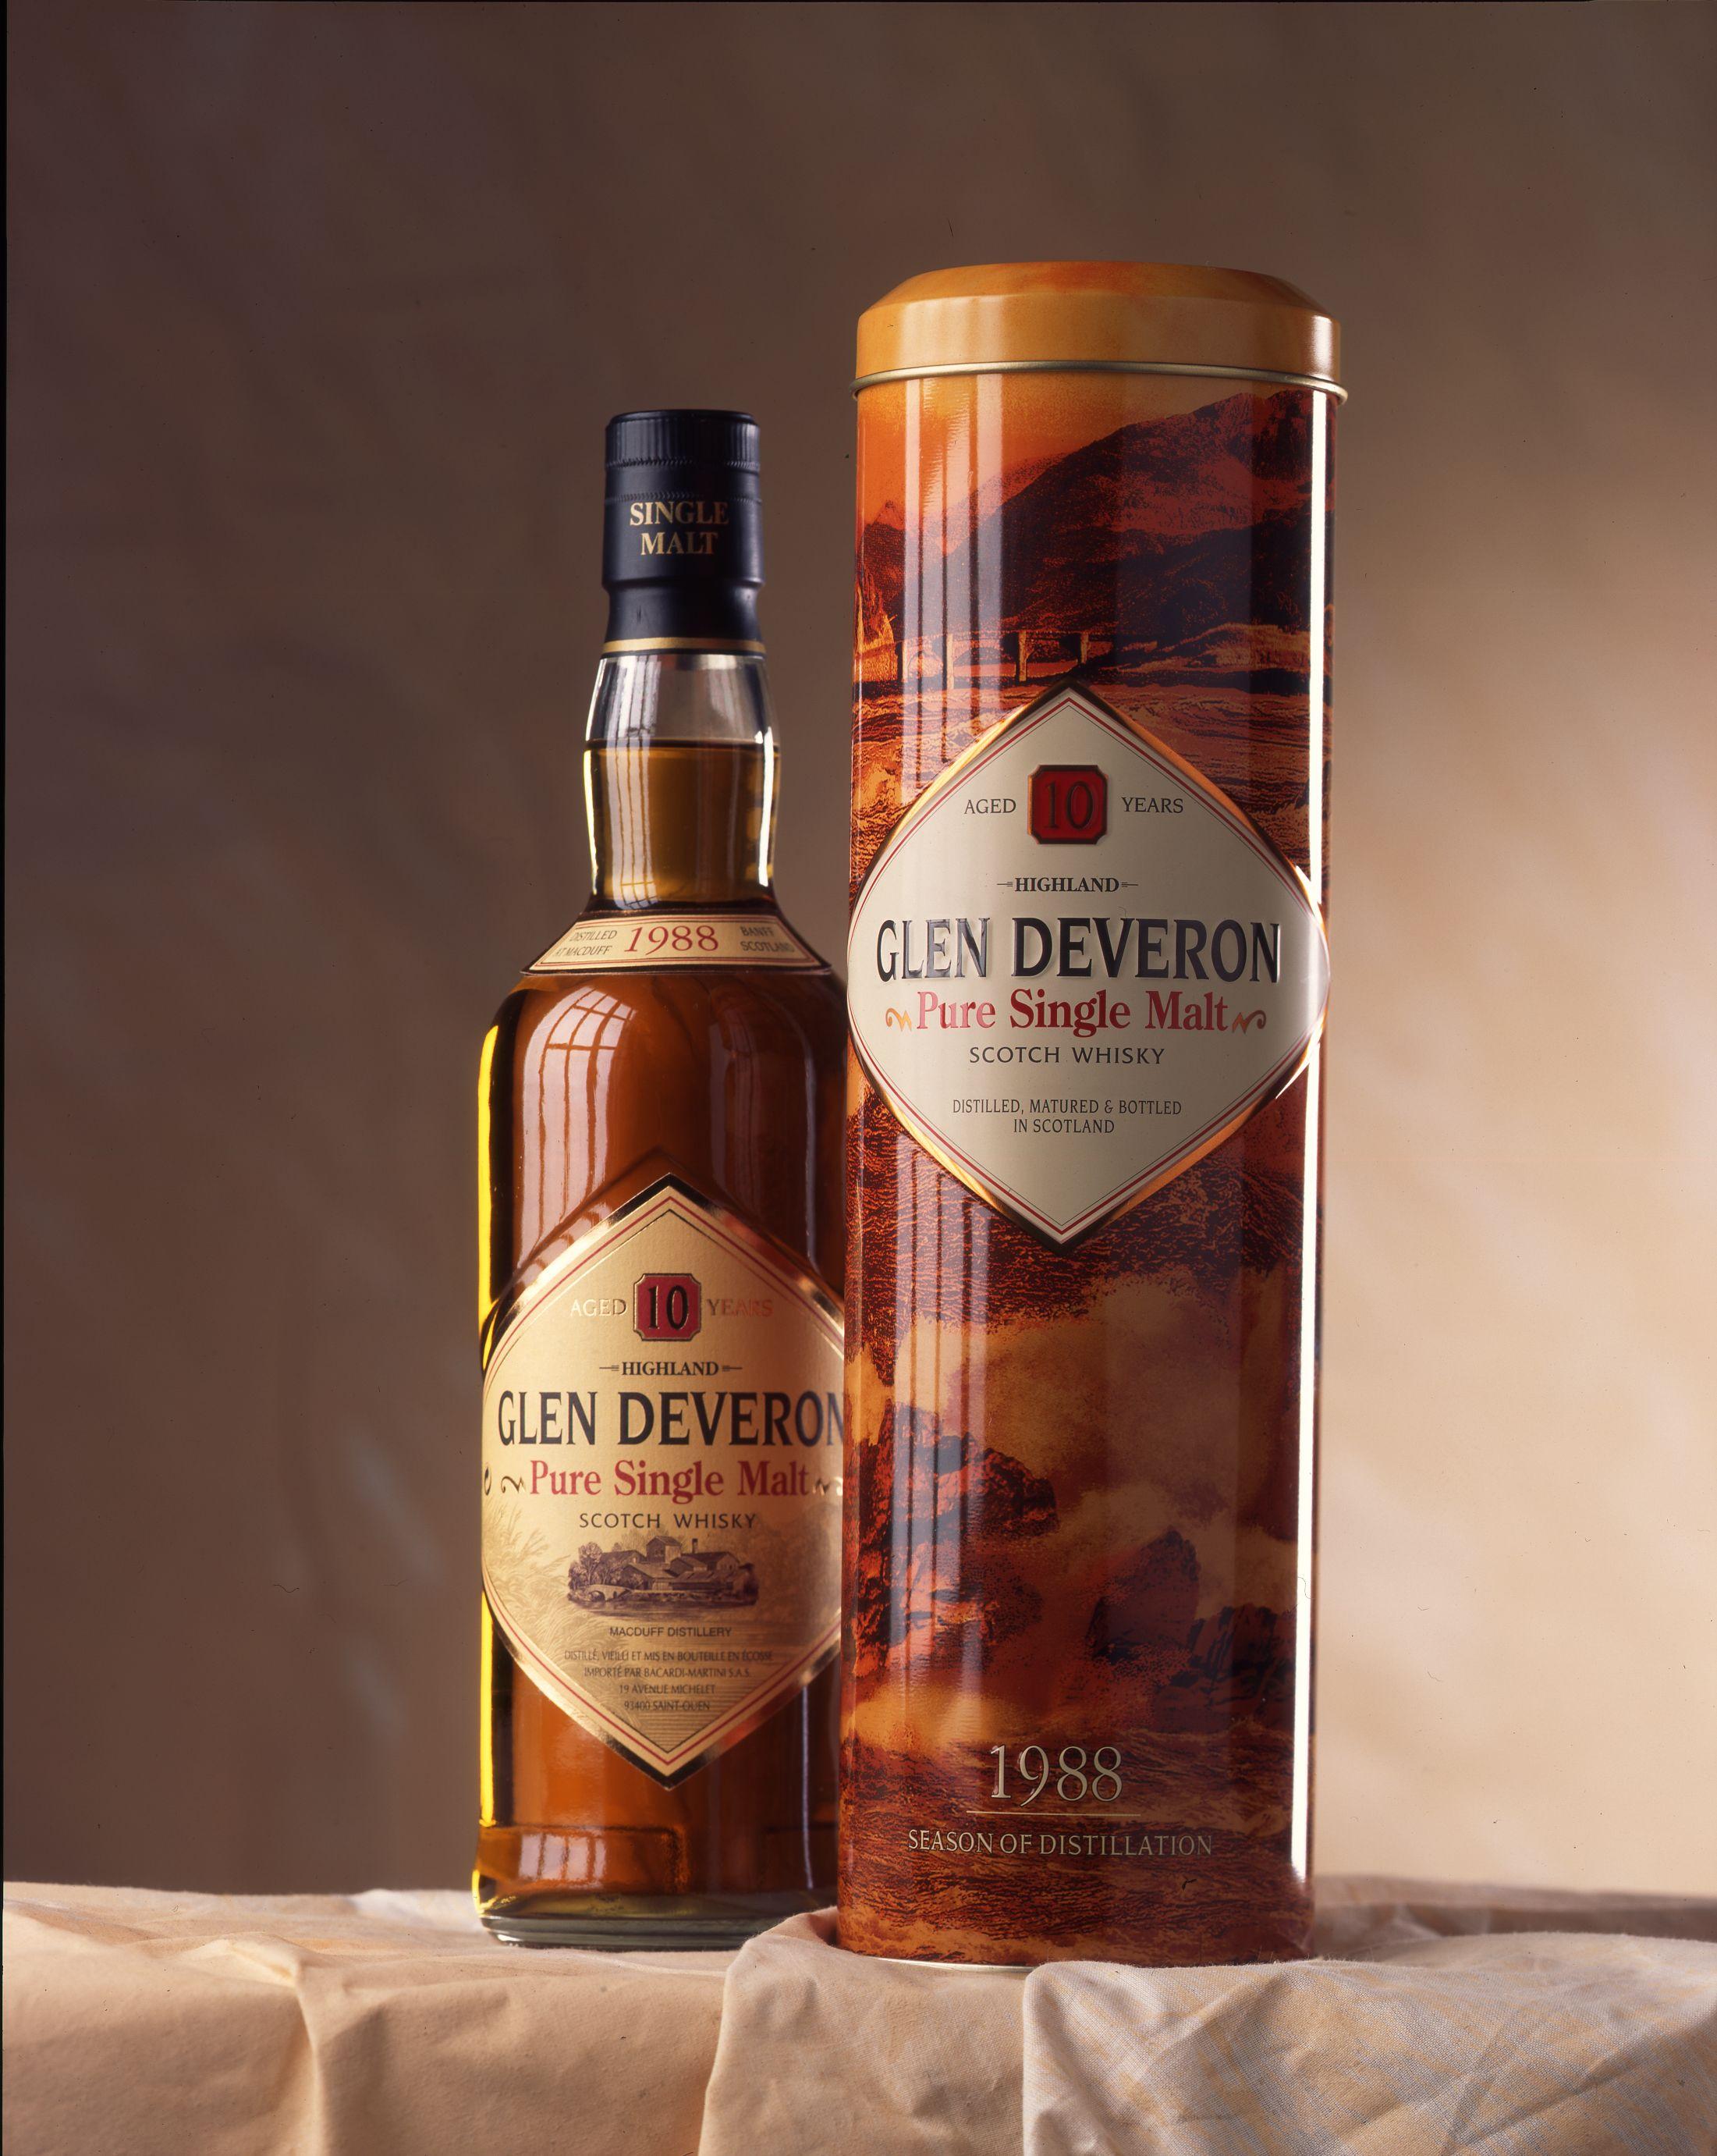 Glen Deveron Whisky Zigarren Und Whisky Whisky In Vino Veritas